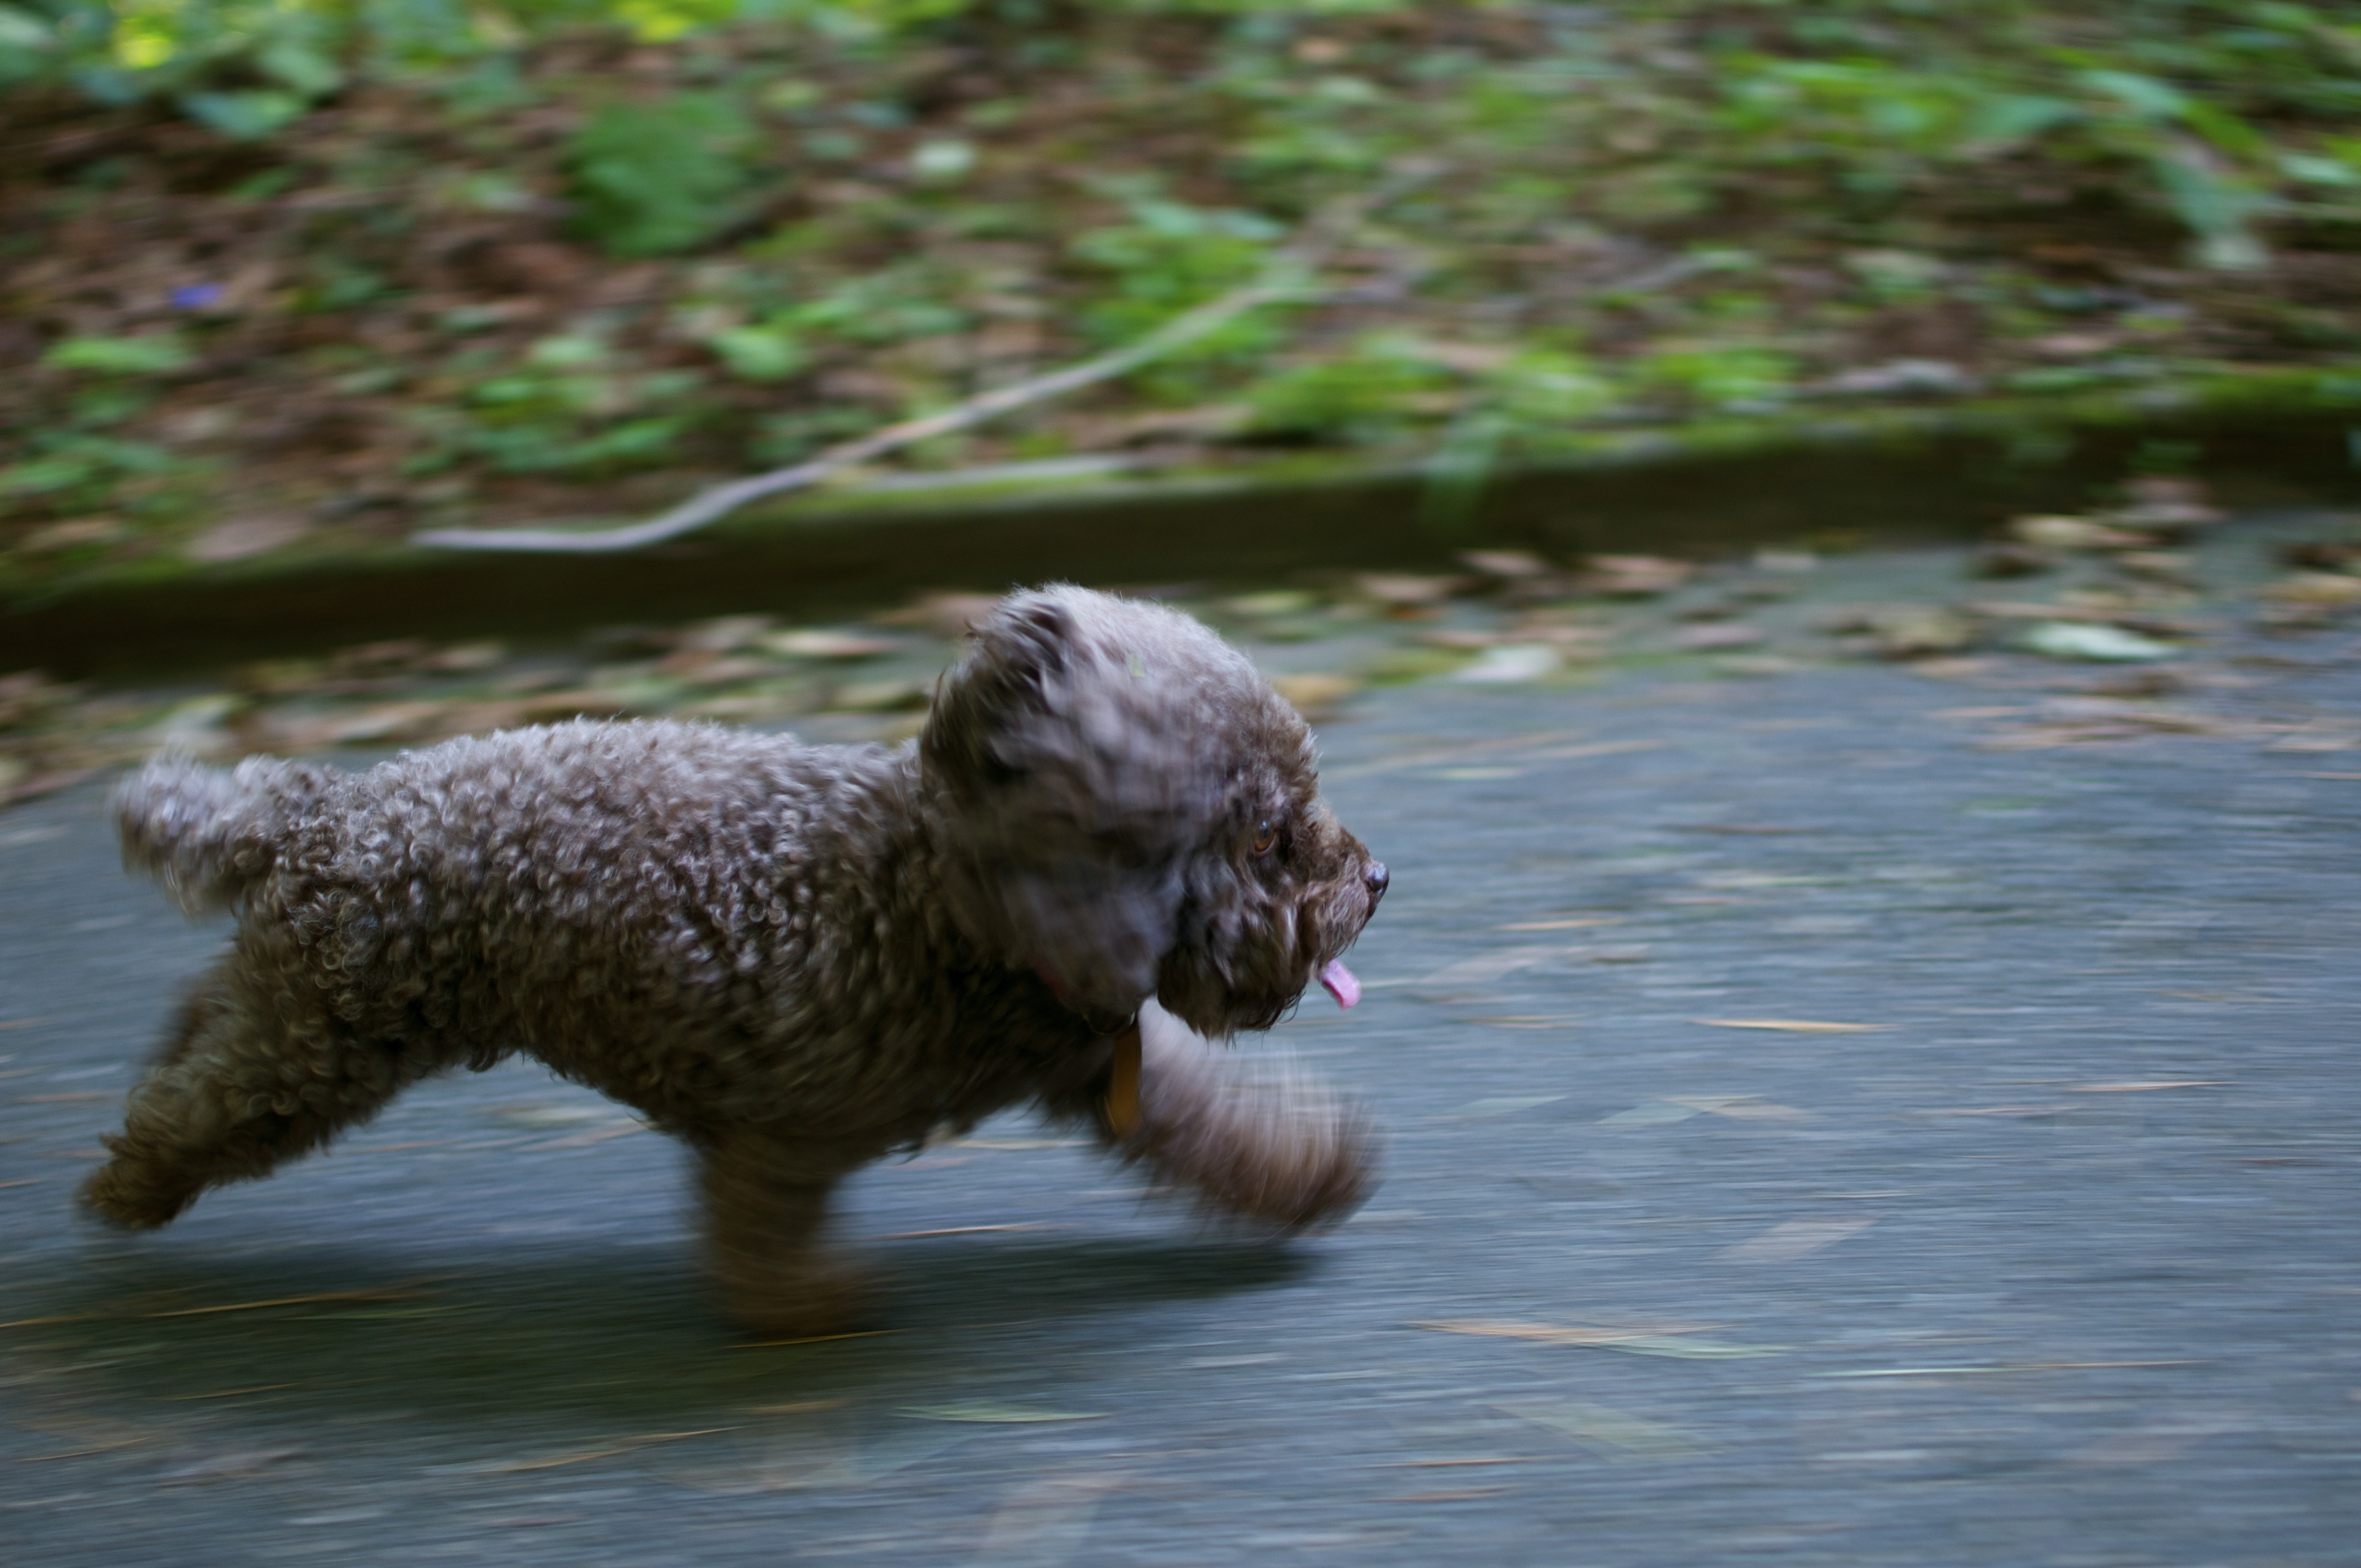 Running Pup, Dog, Friend, Loyal, Pet, HQ Photo